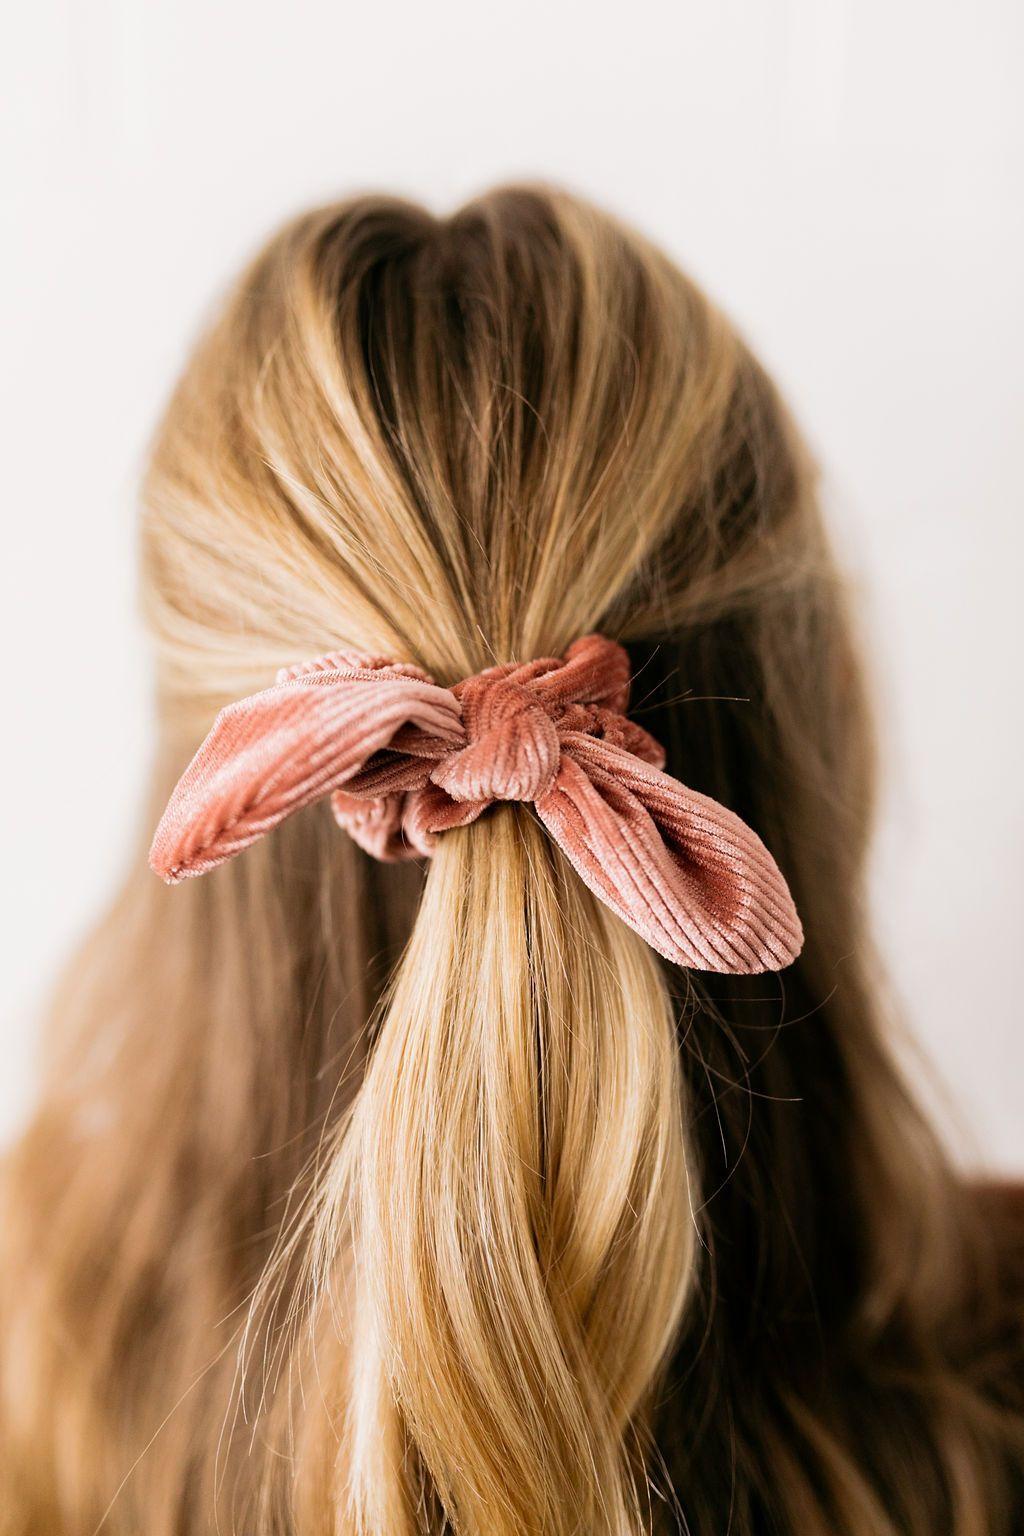 Park Art My WordPress Blog_L Erickson Hair Ties Near Me